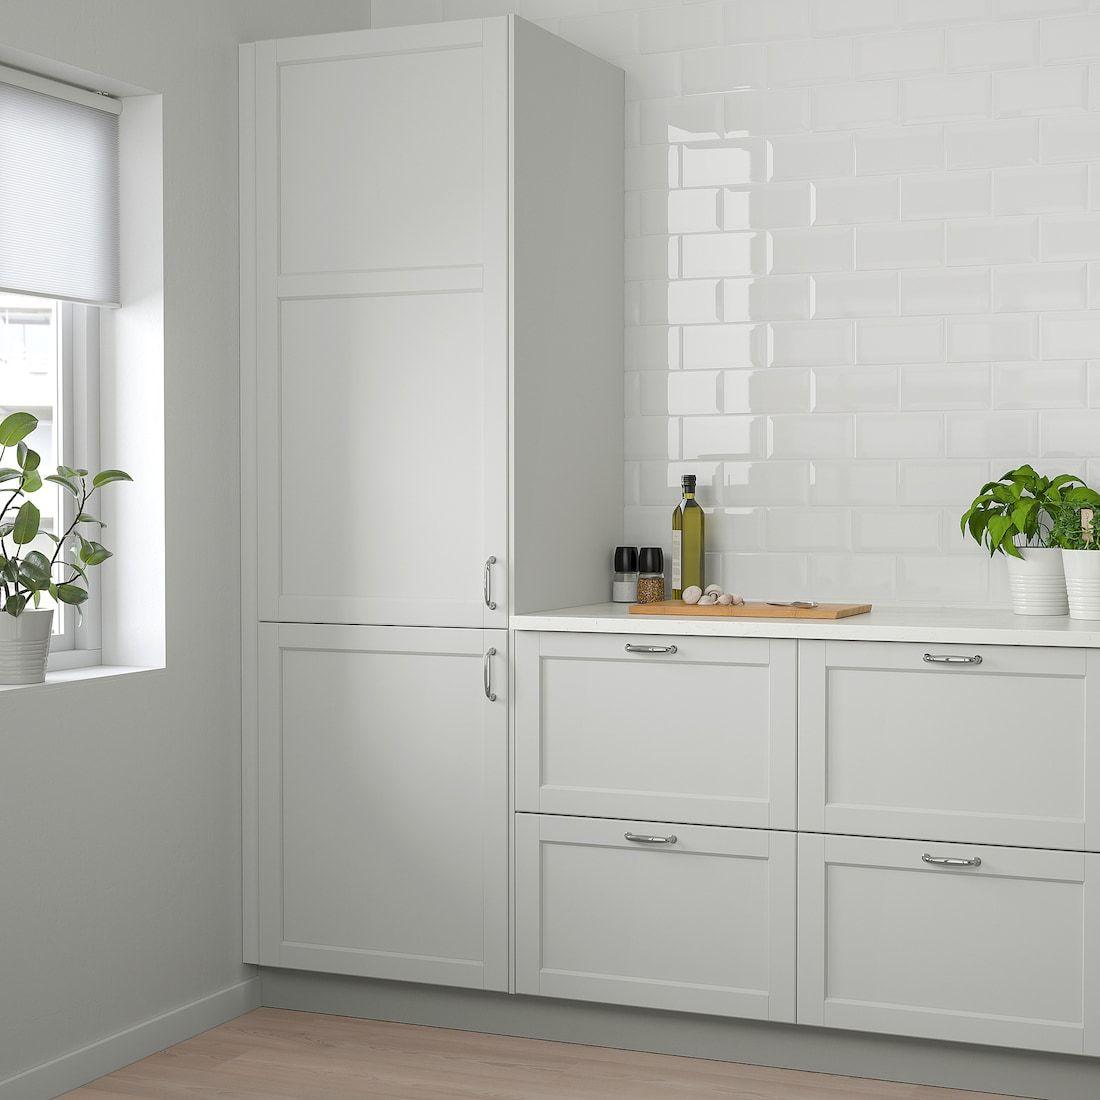 Lerhyttan Door Light Gray 21x30 Ikea Ikea Kitchen Storage Kitchen Doors Ikea Kitchen